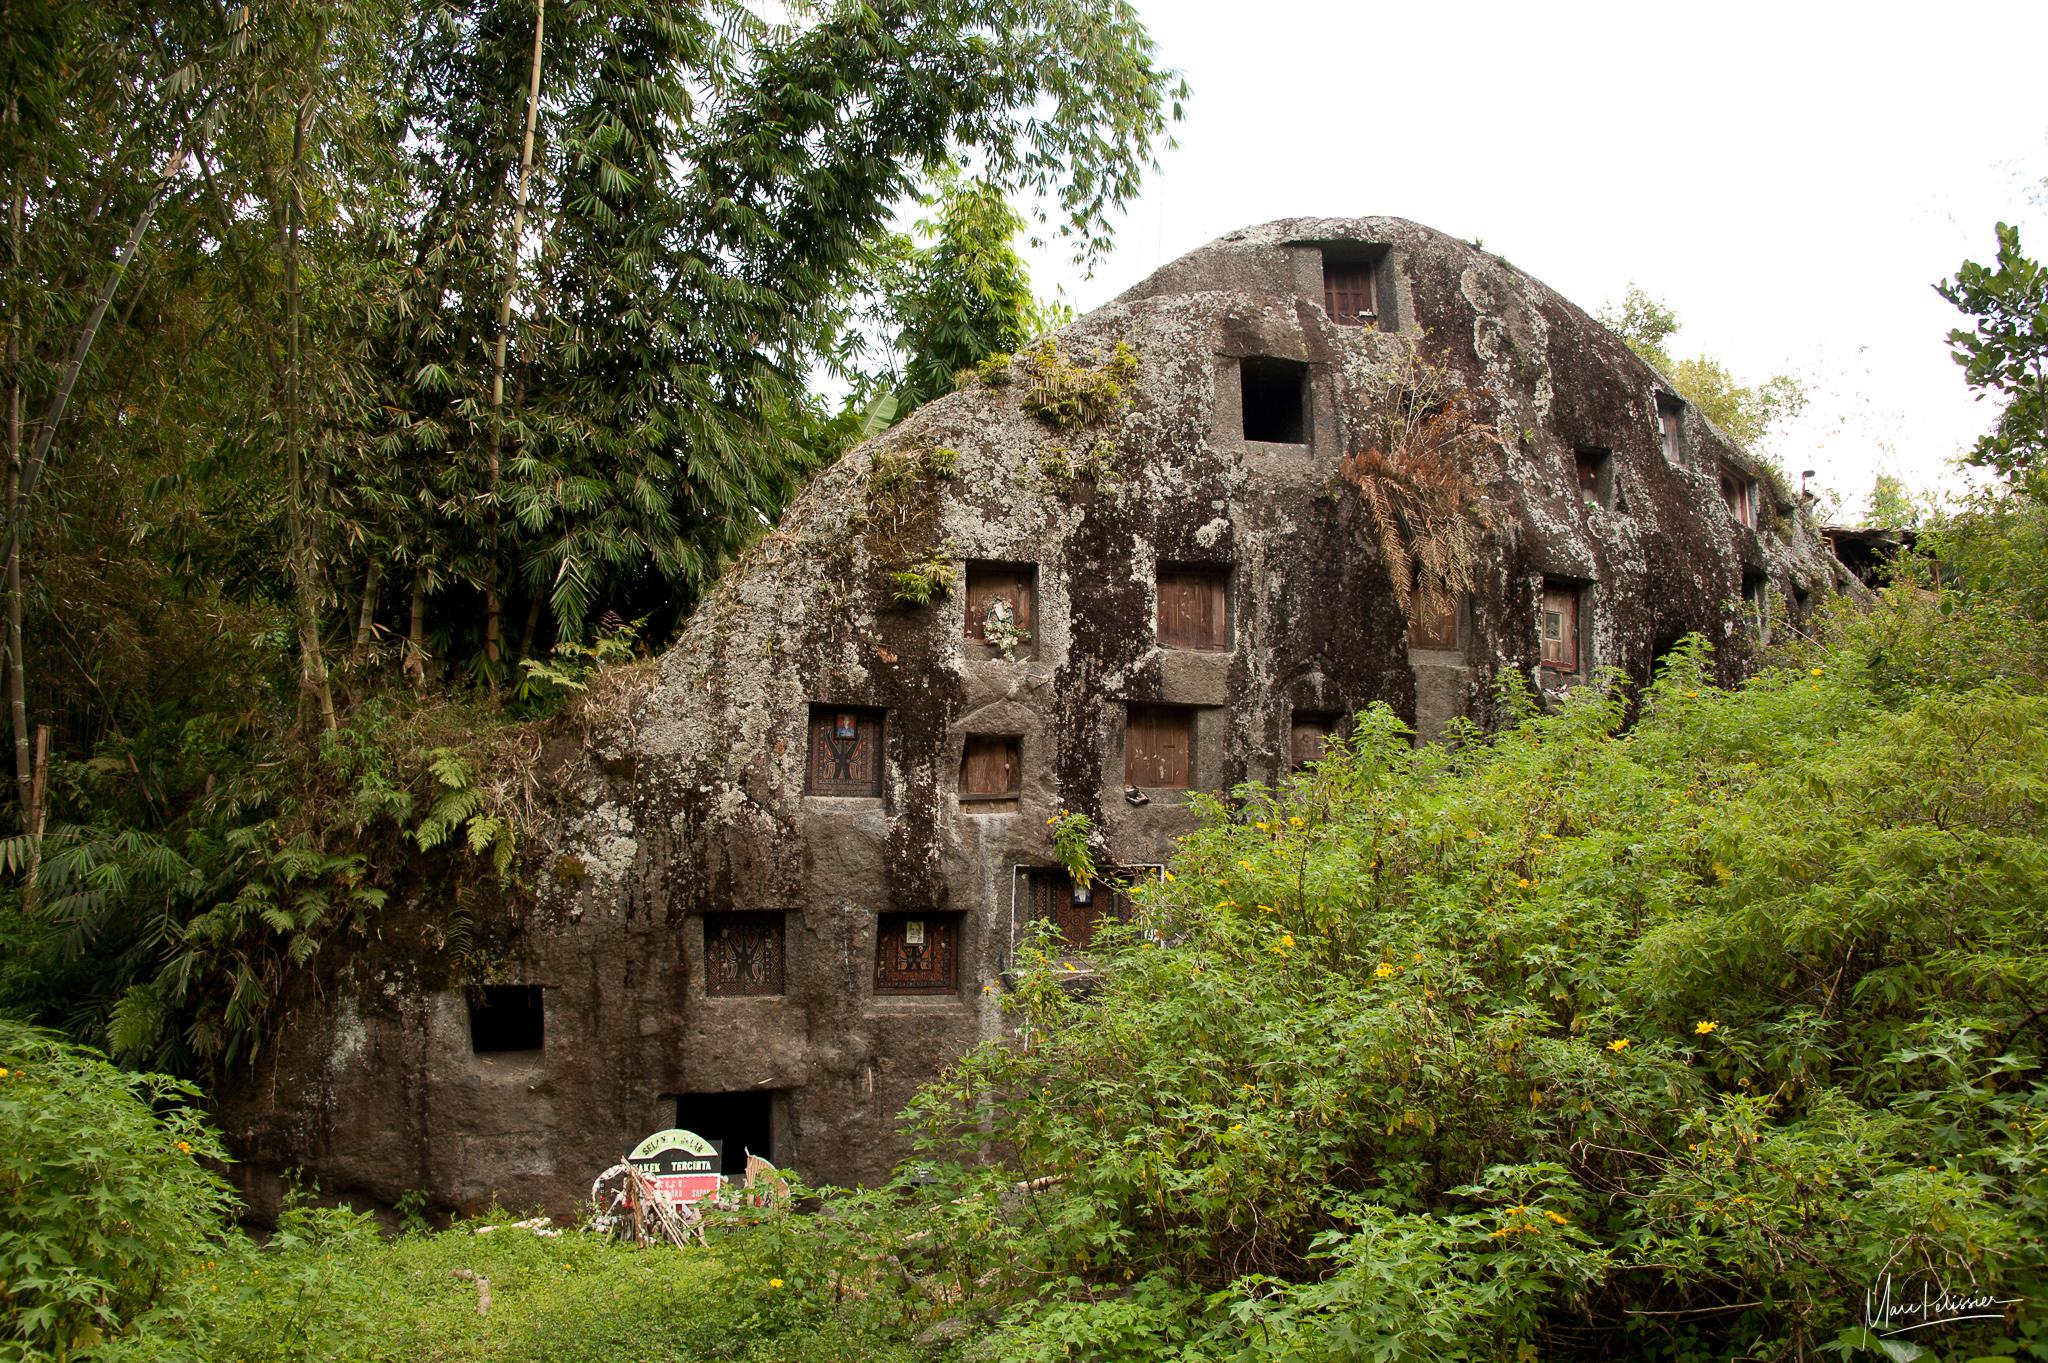 Pana child grave rock cemetery, Indonesia